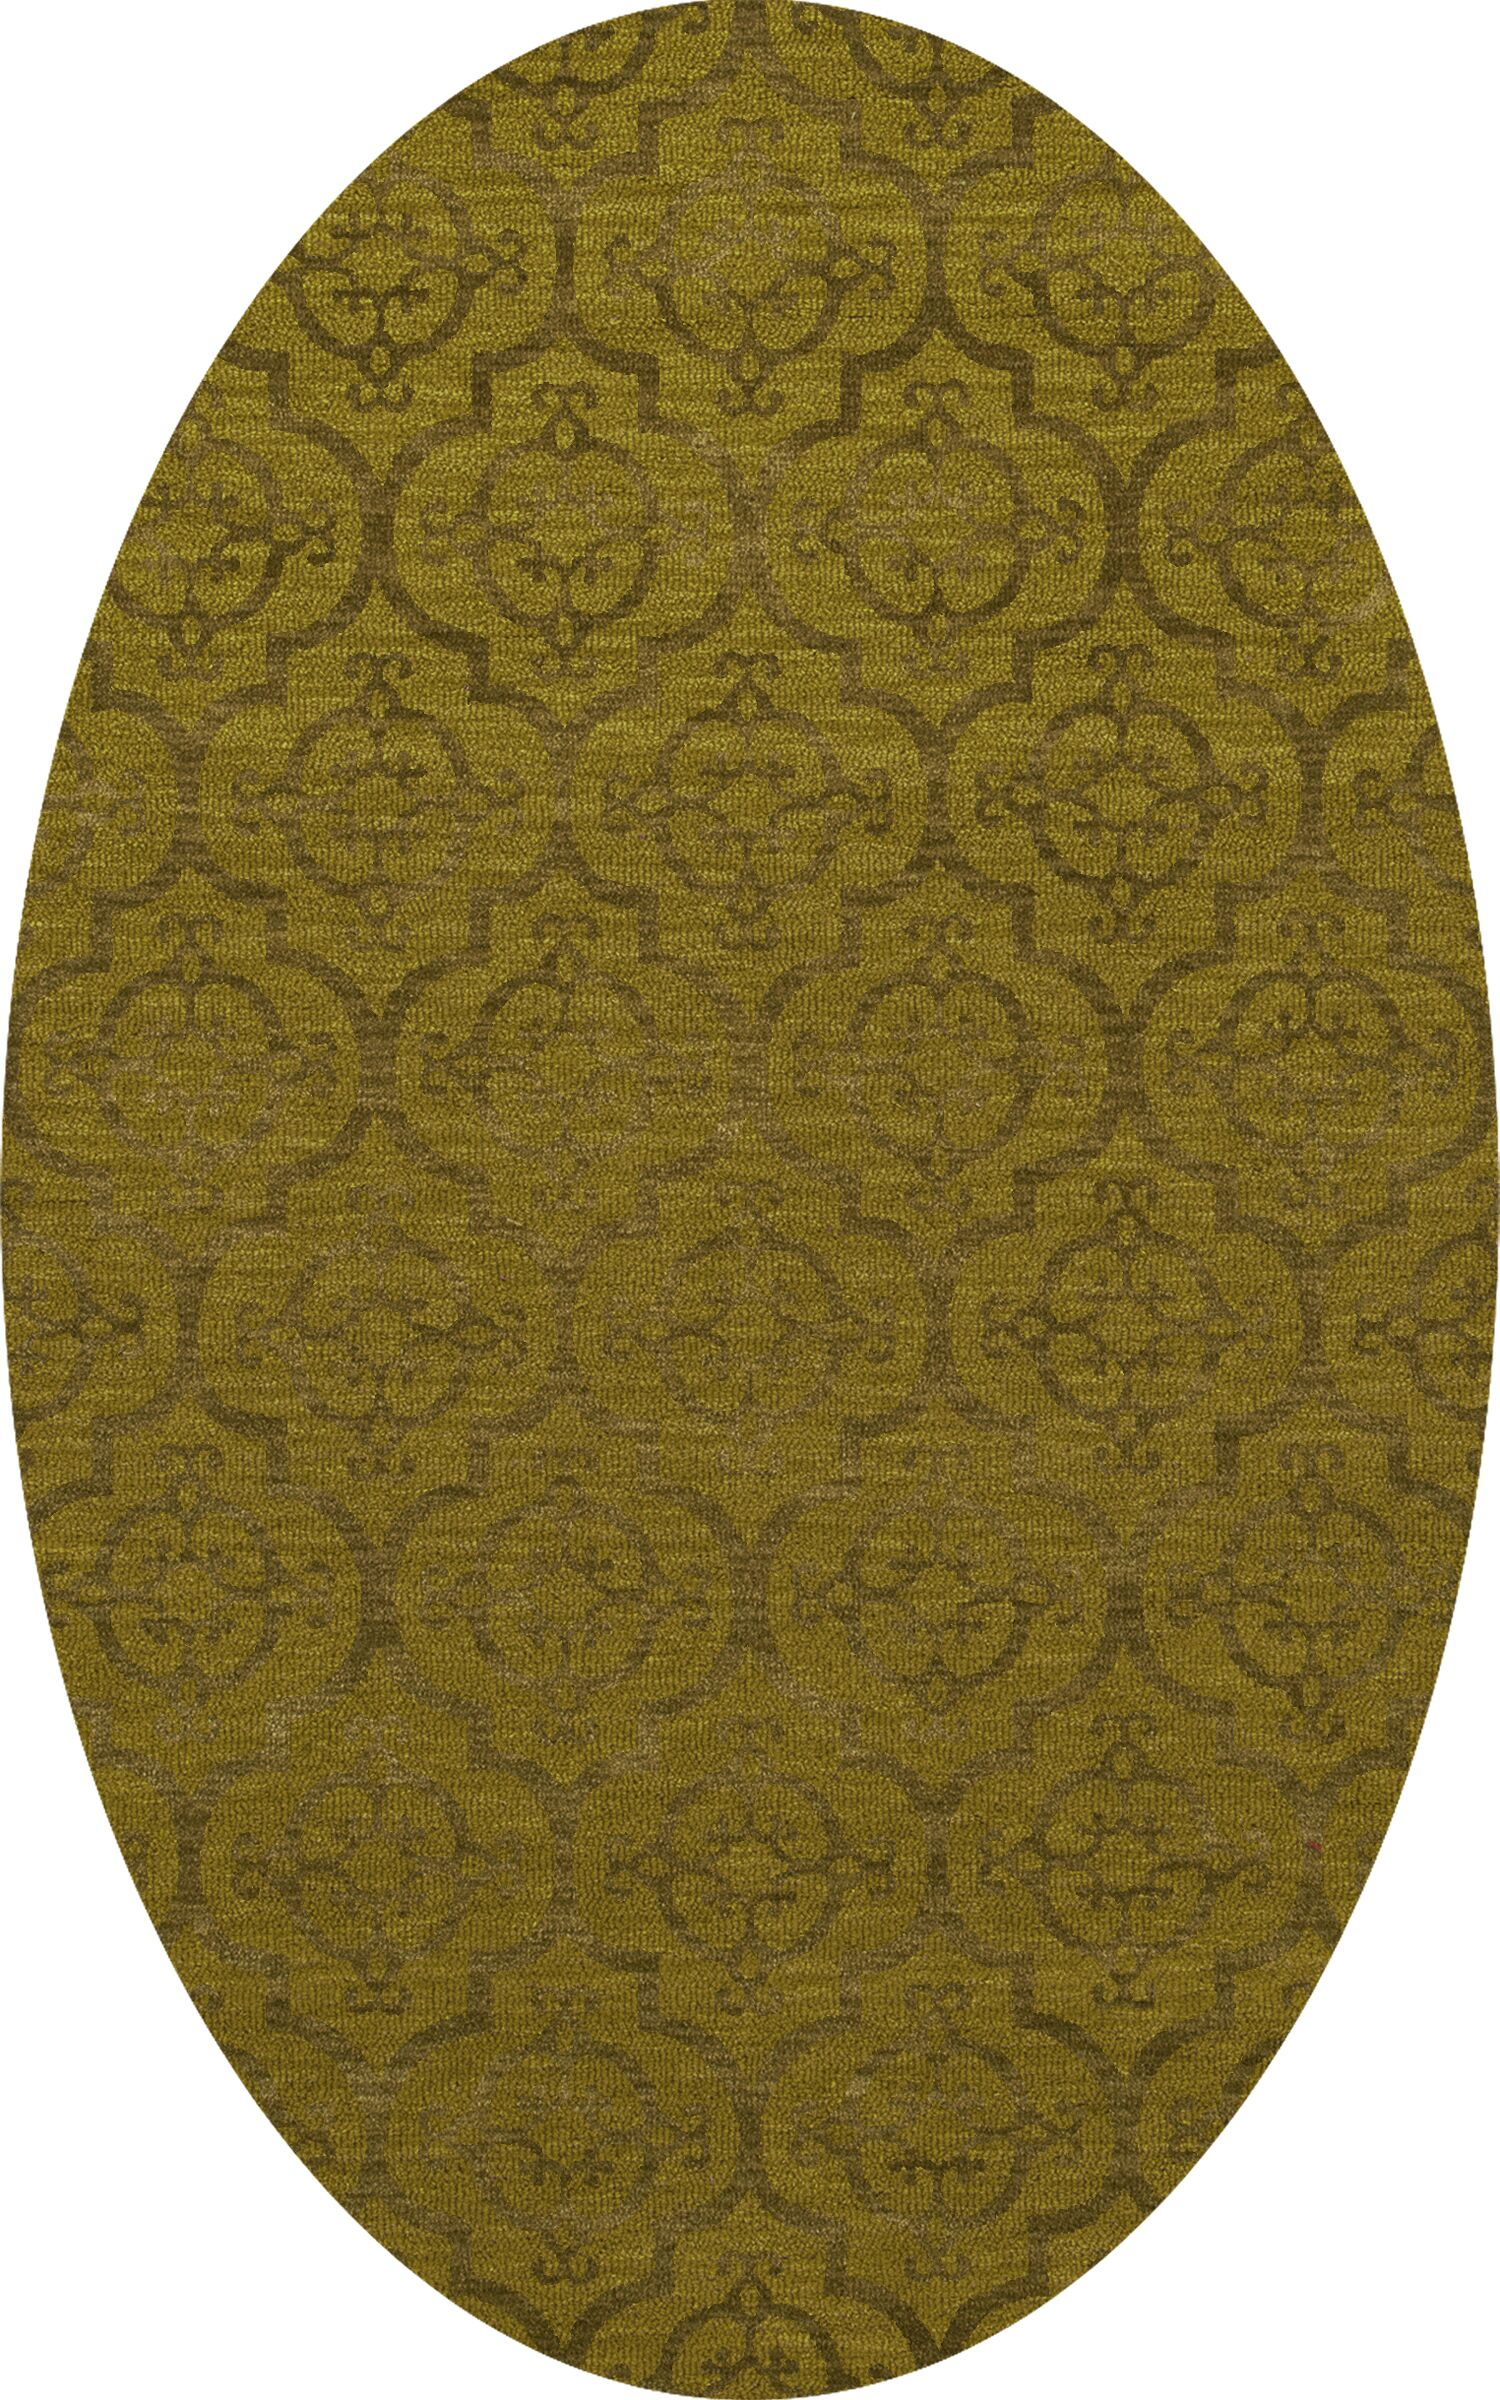 Bella Machine Woven Wool Avocado Area Rug Rug Size: Oval 5' x 8'